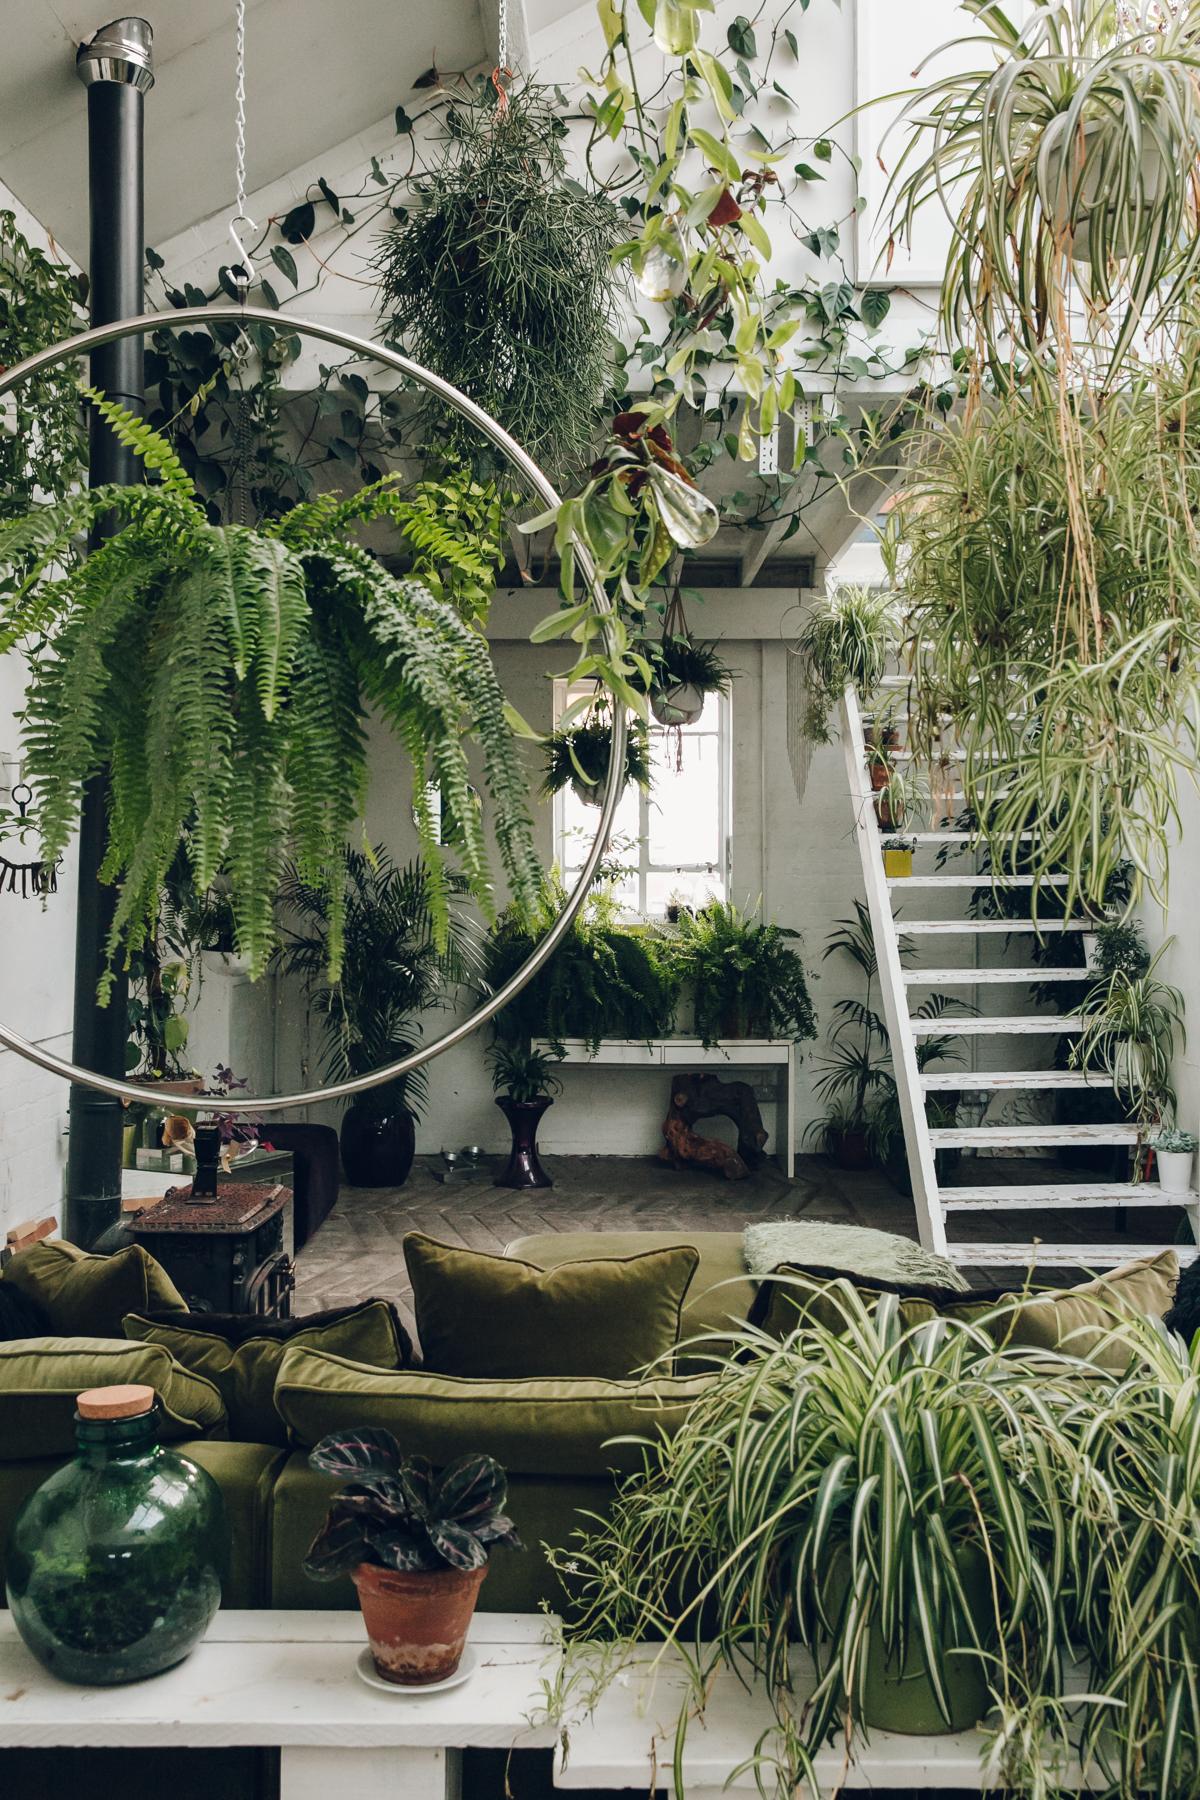 plantseverywhereinsideclaptontram-alightwarehousespace